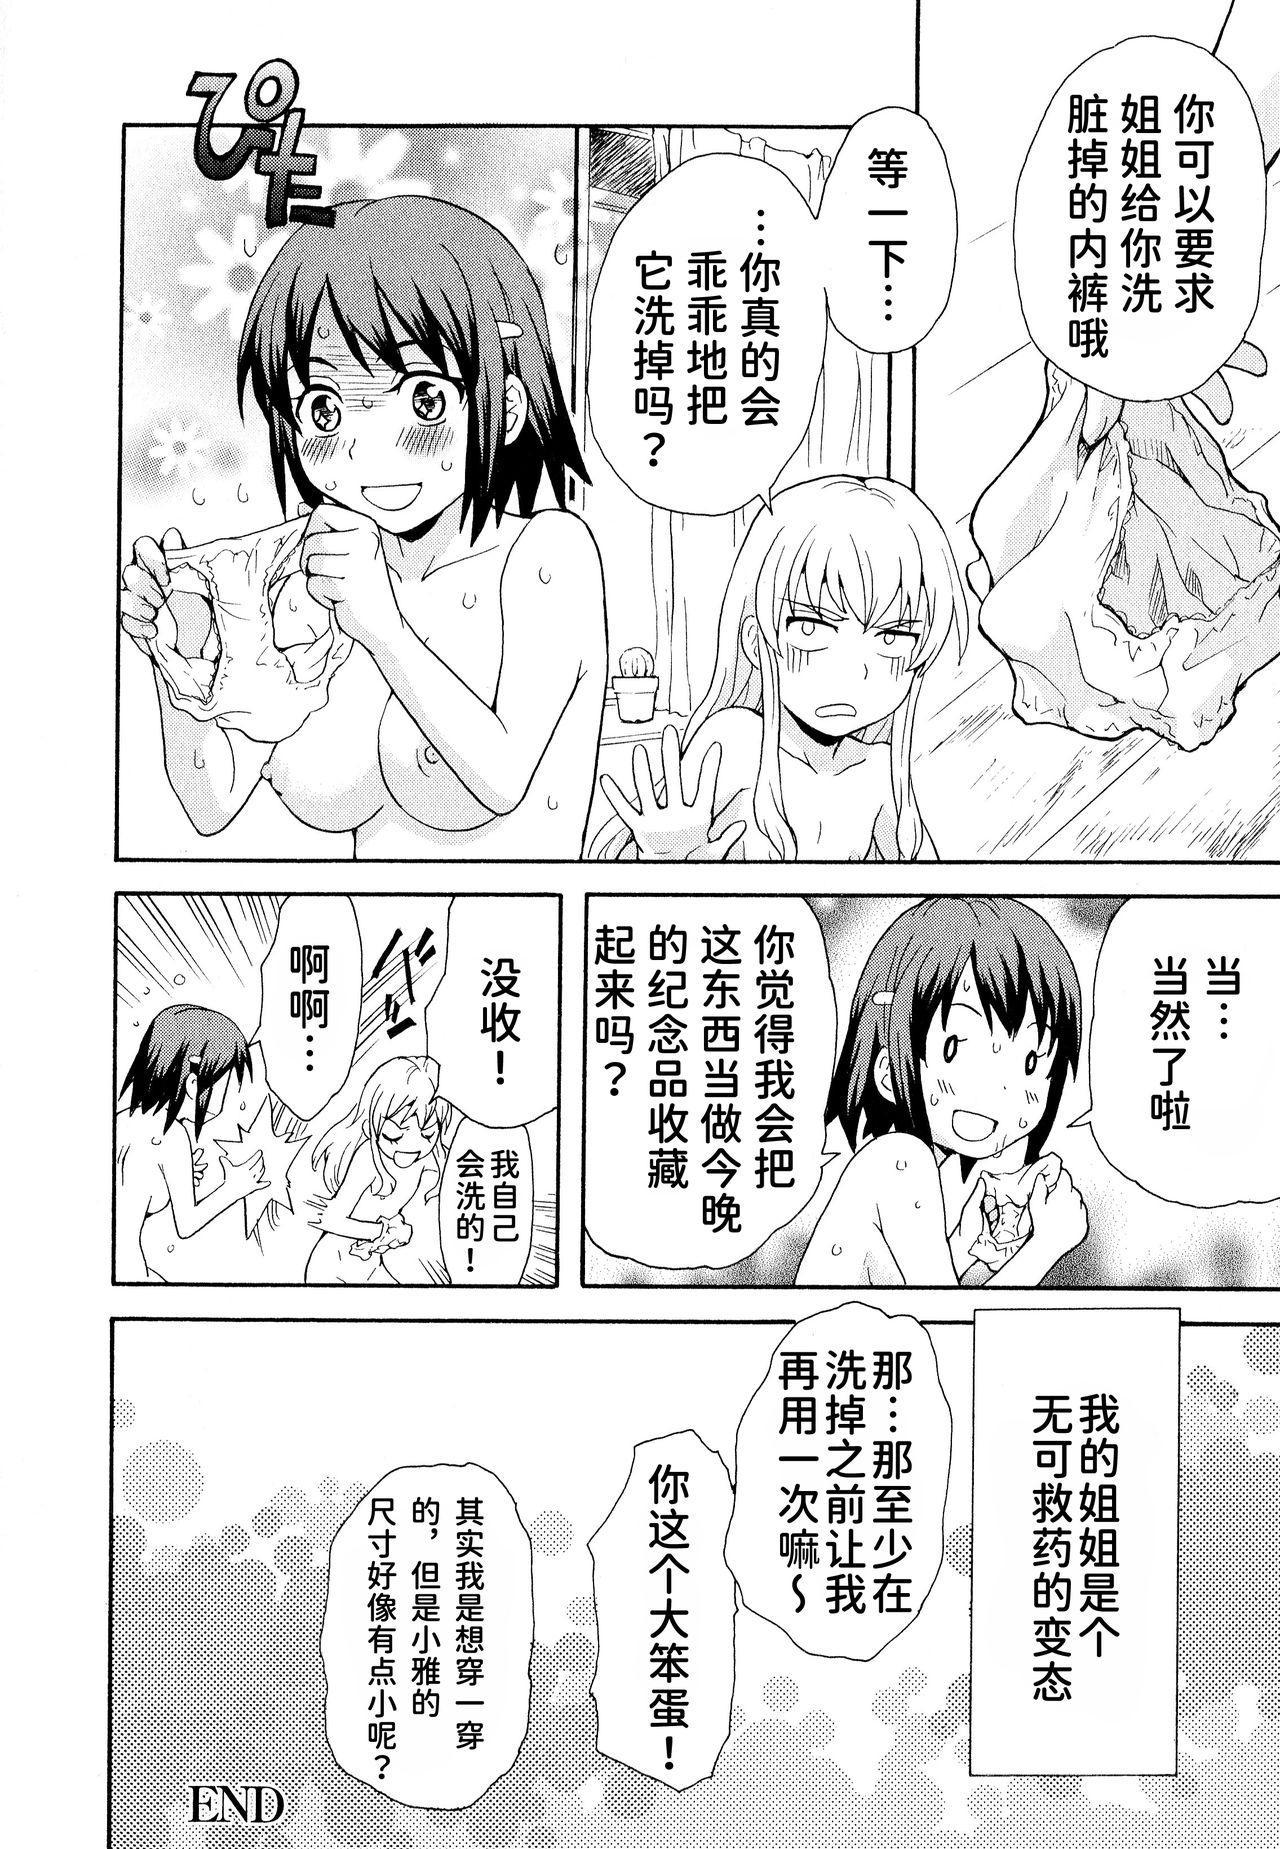 [Sudoo Kaoru] Onee-chan wa Imouto-chan o Aishiteru   爱上了妹妹的姐姐 (Aya Yuri Vol. 11) [Chinese] [SAW汉化组] 24